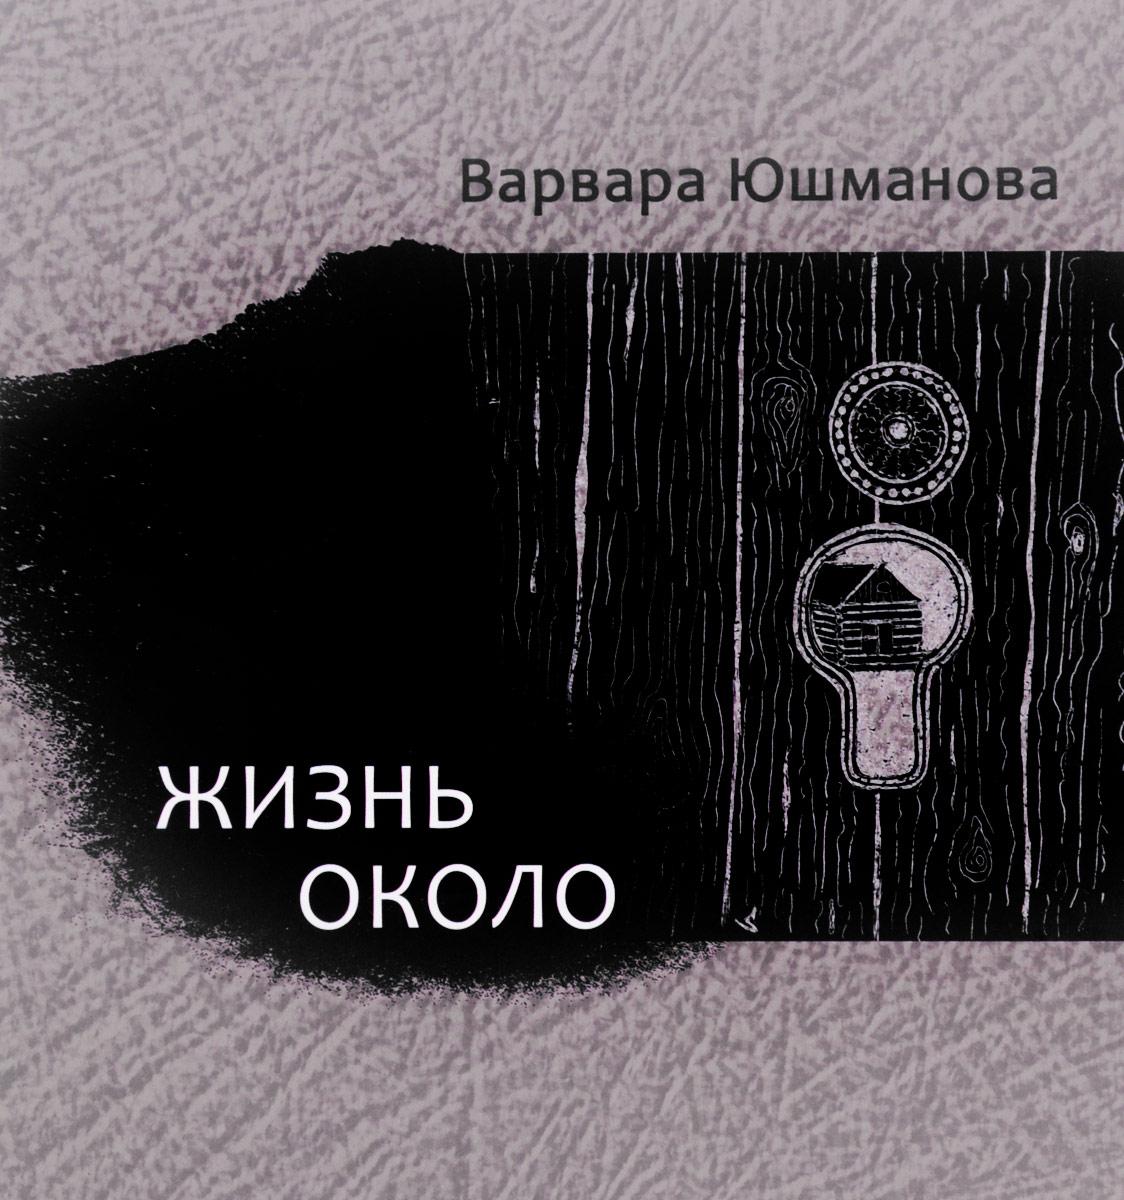 Варвара Юшманова Жизнь около